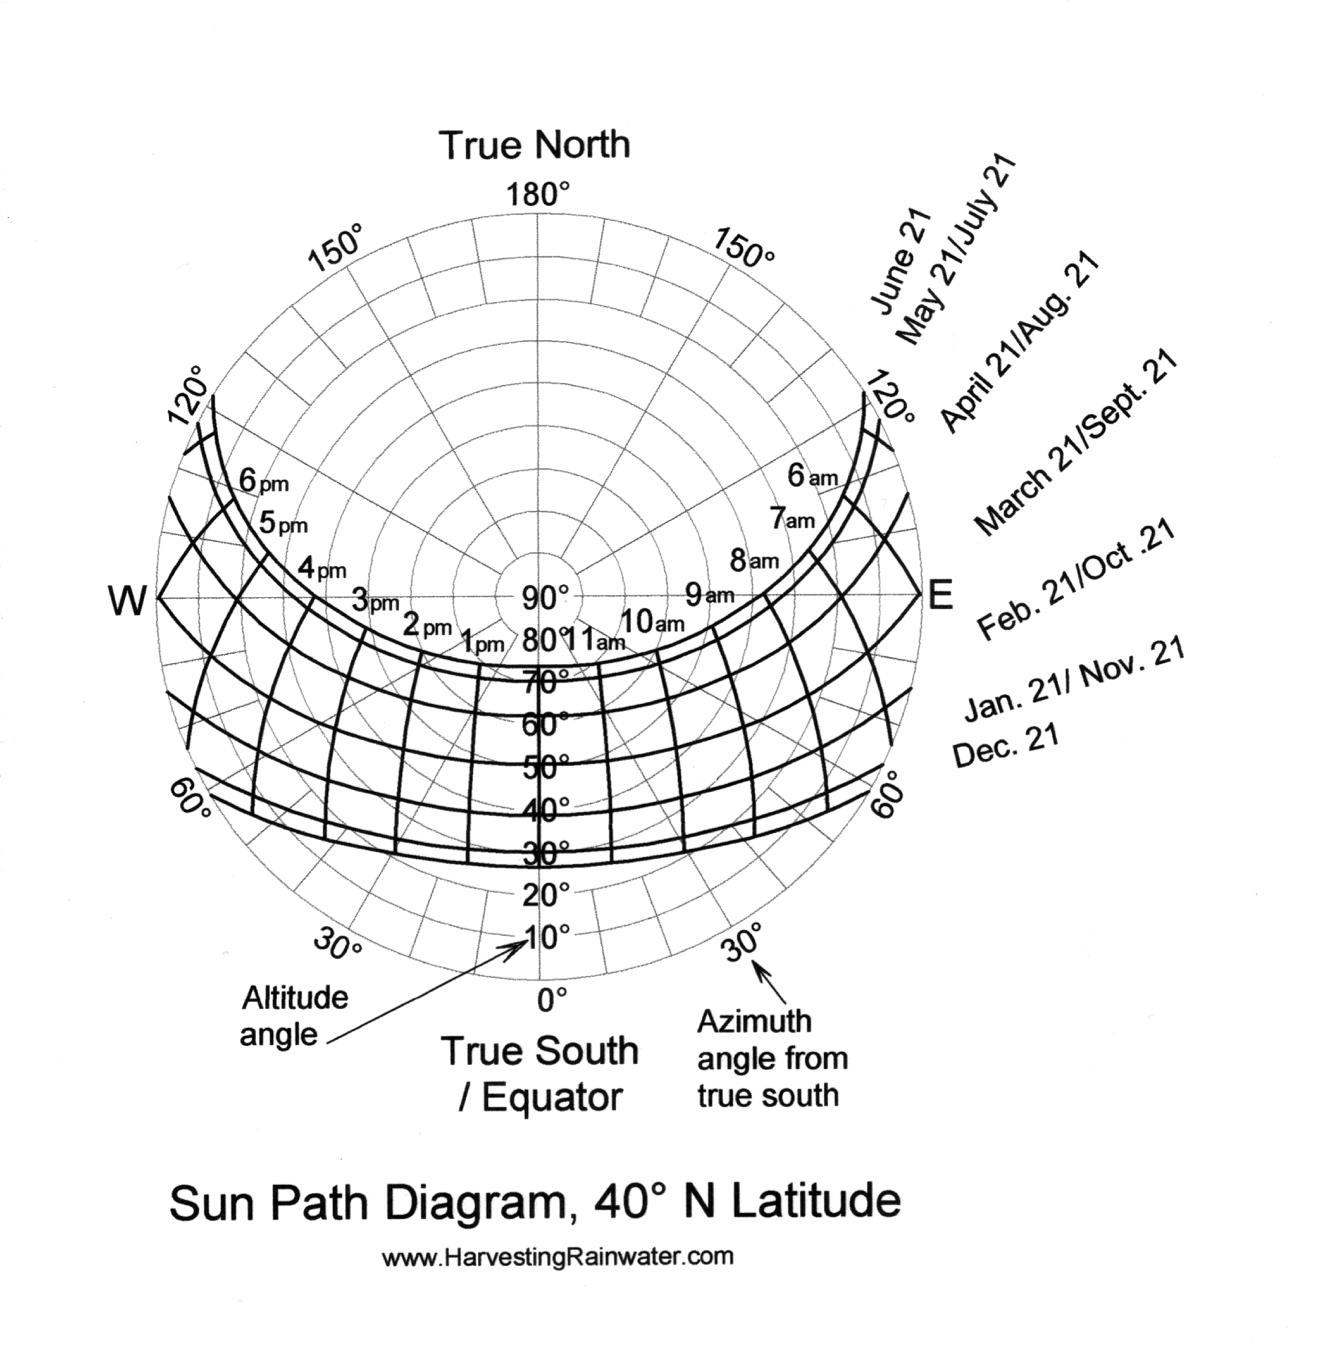 hight resolution of sun path diagram 40 n latitude